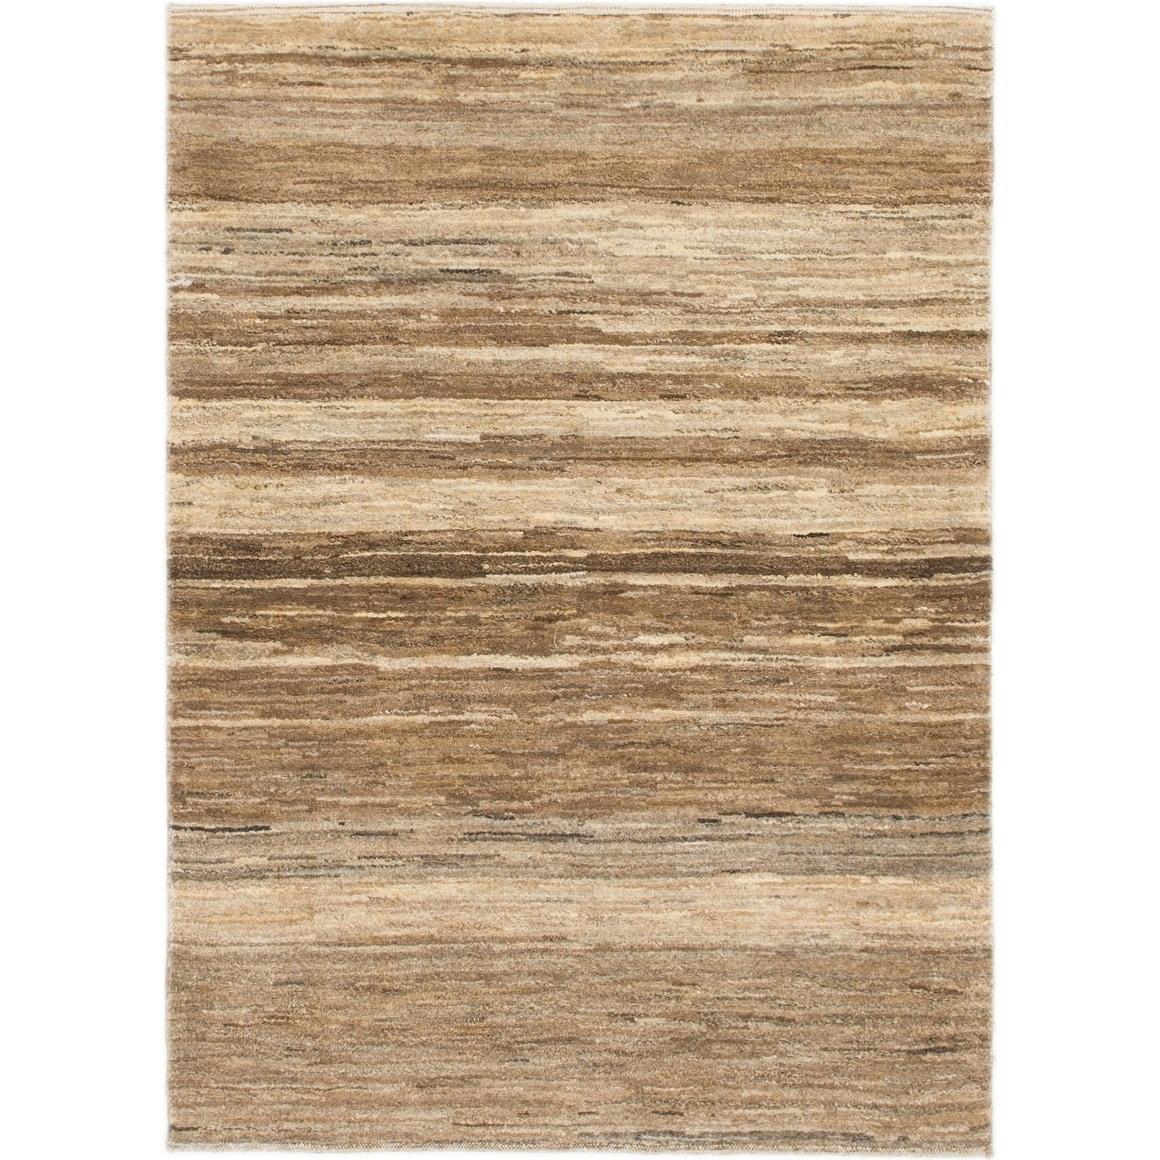 Hand Knotted Kashkuli Gabbeh Wool Area Rug - 3 6 x 4 10 (Brown - 3 6 x 4 10)